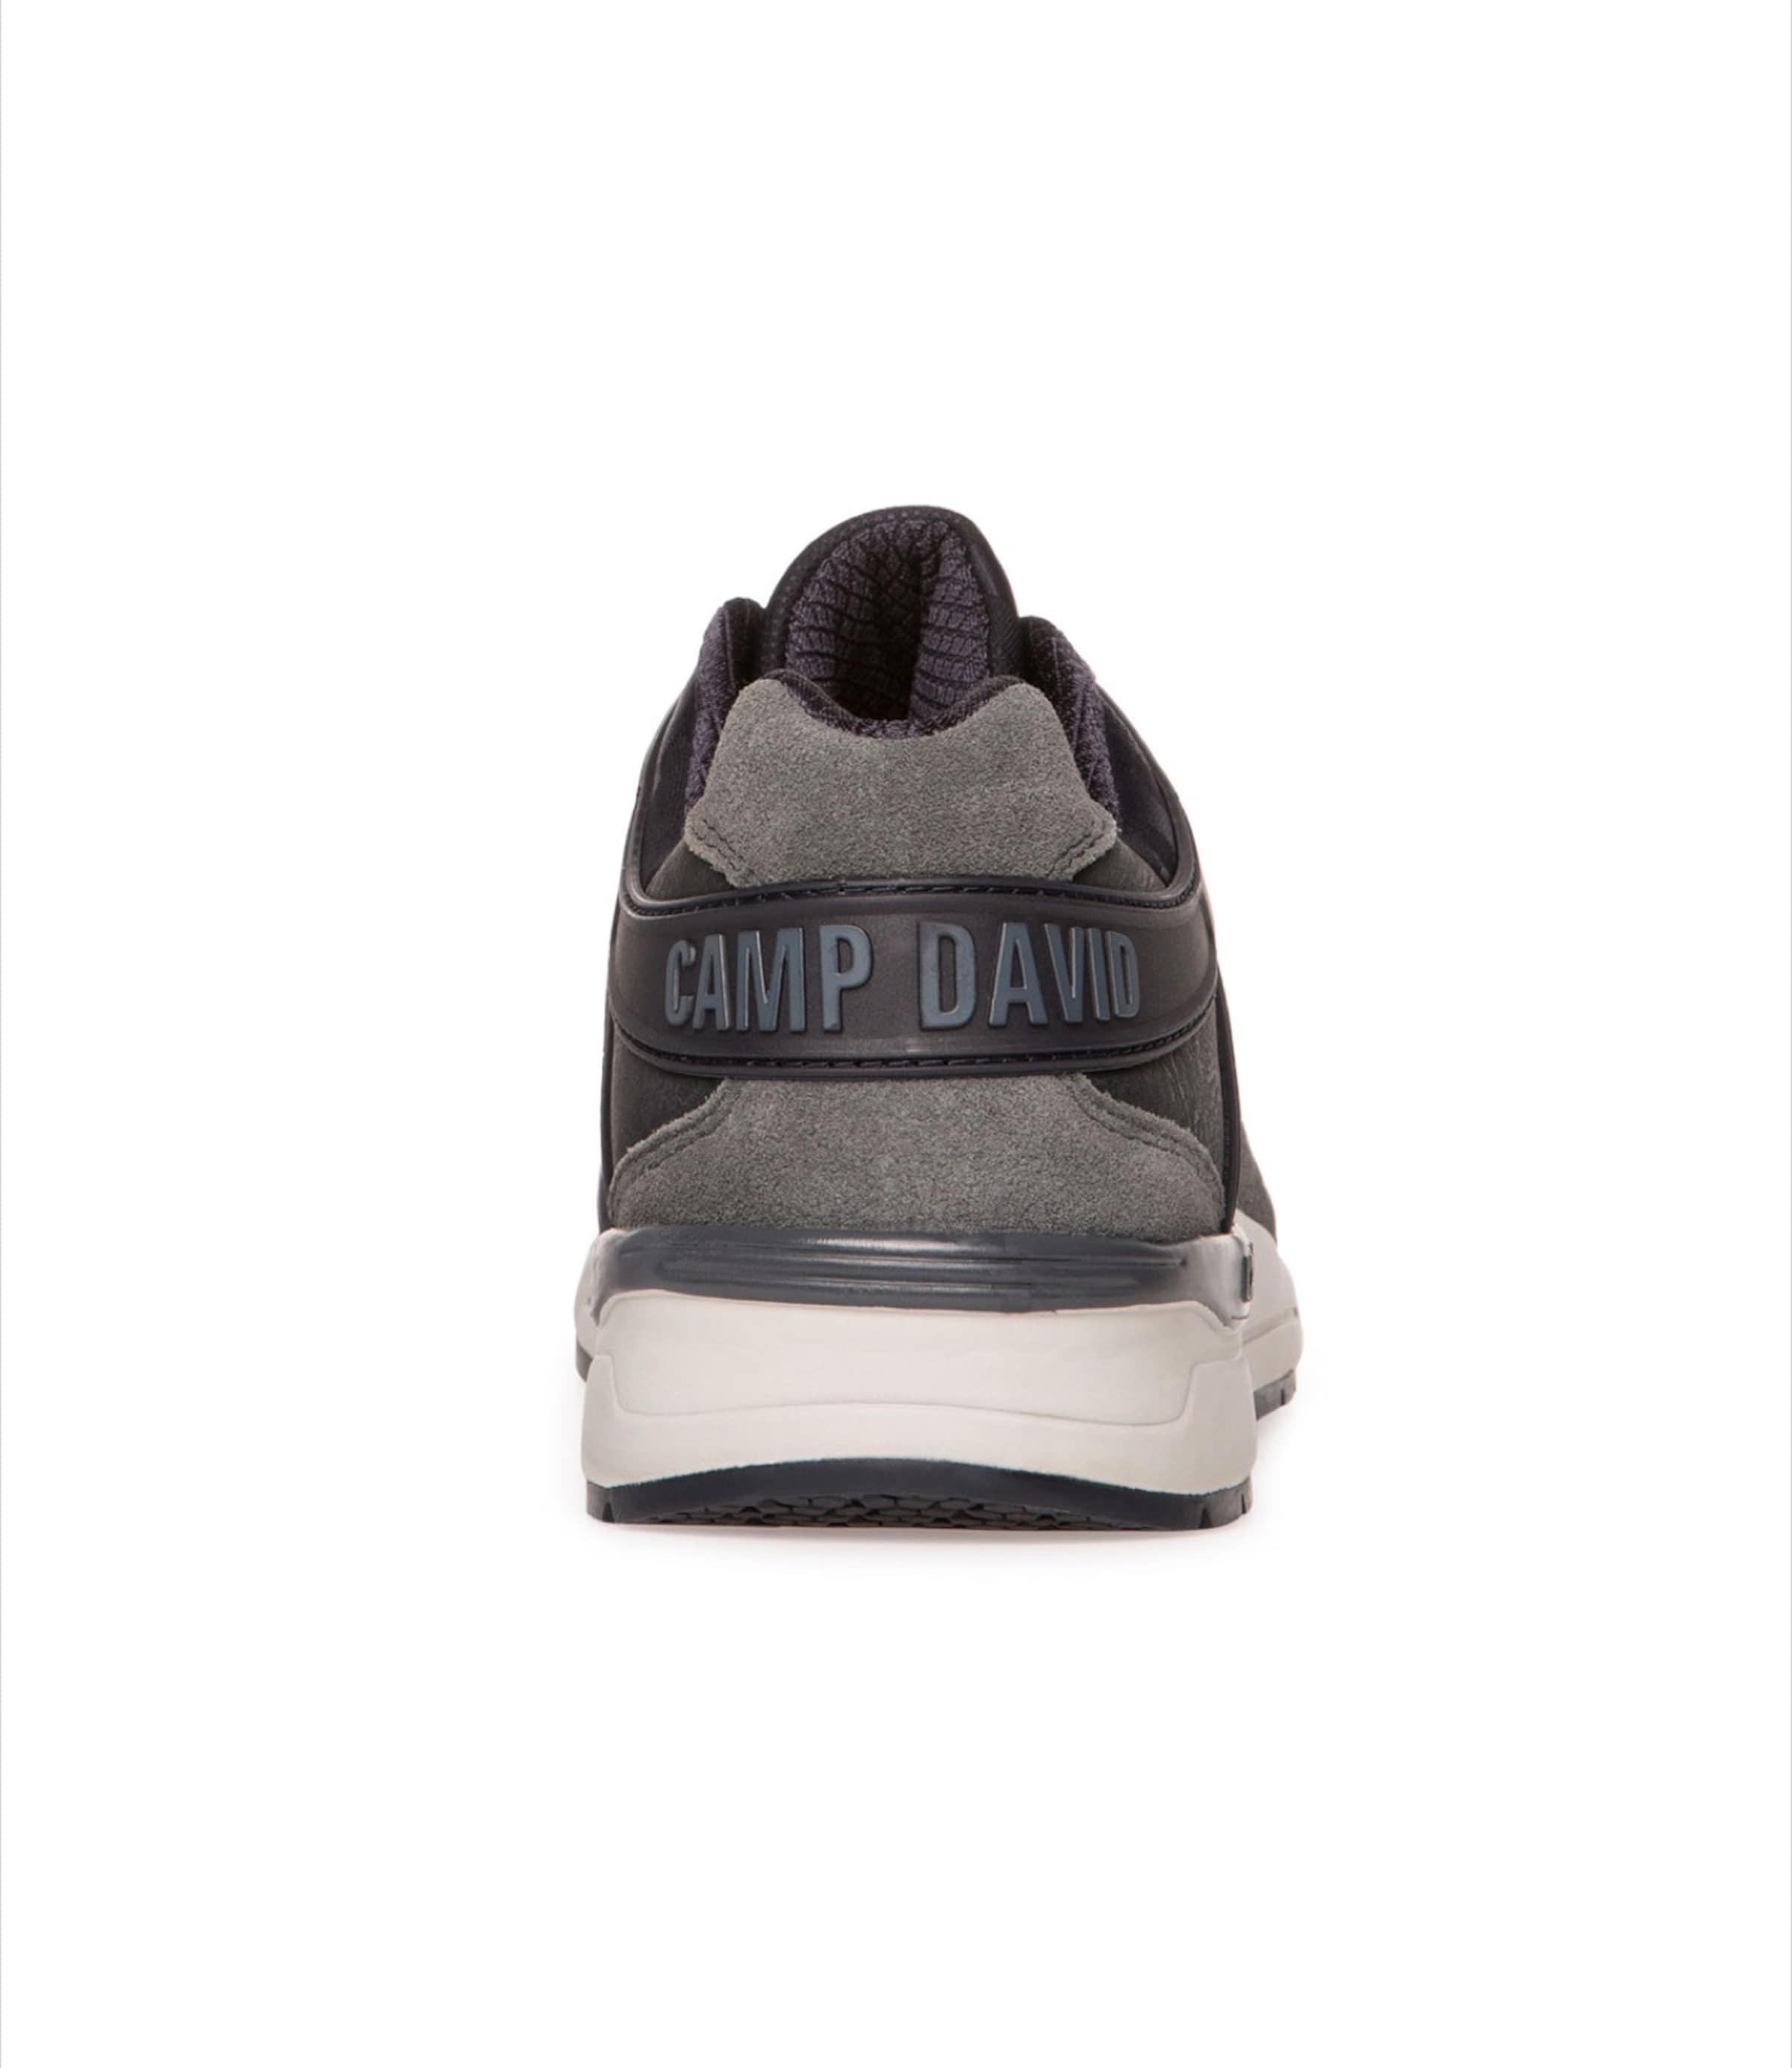 NachtblauSchwarz Sneaker David In Sneaker Camp David In Camp AjLq45cS3R